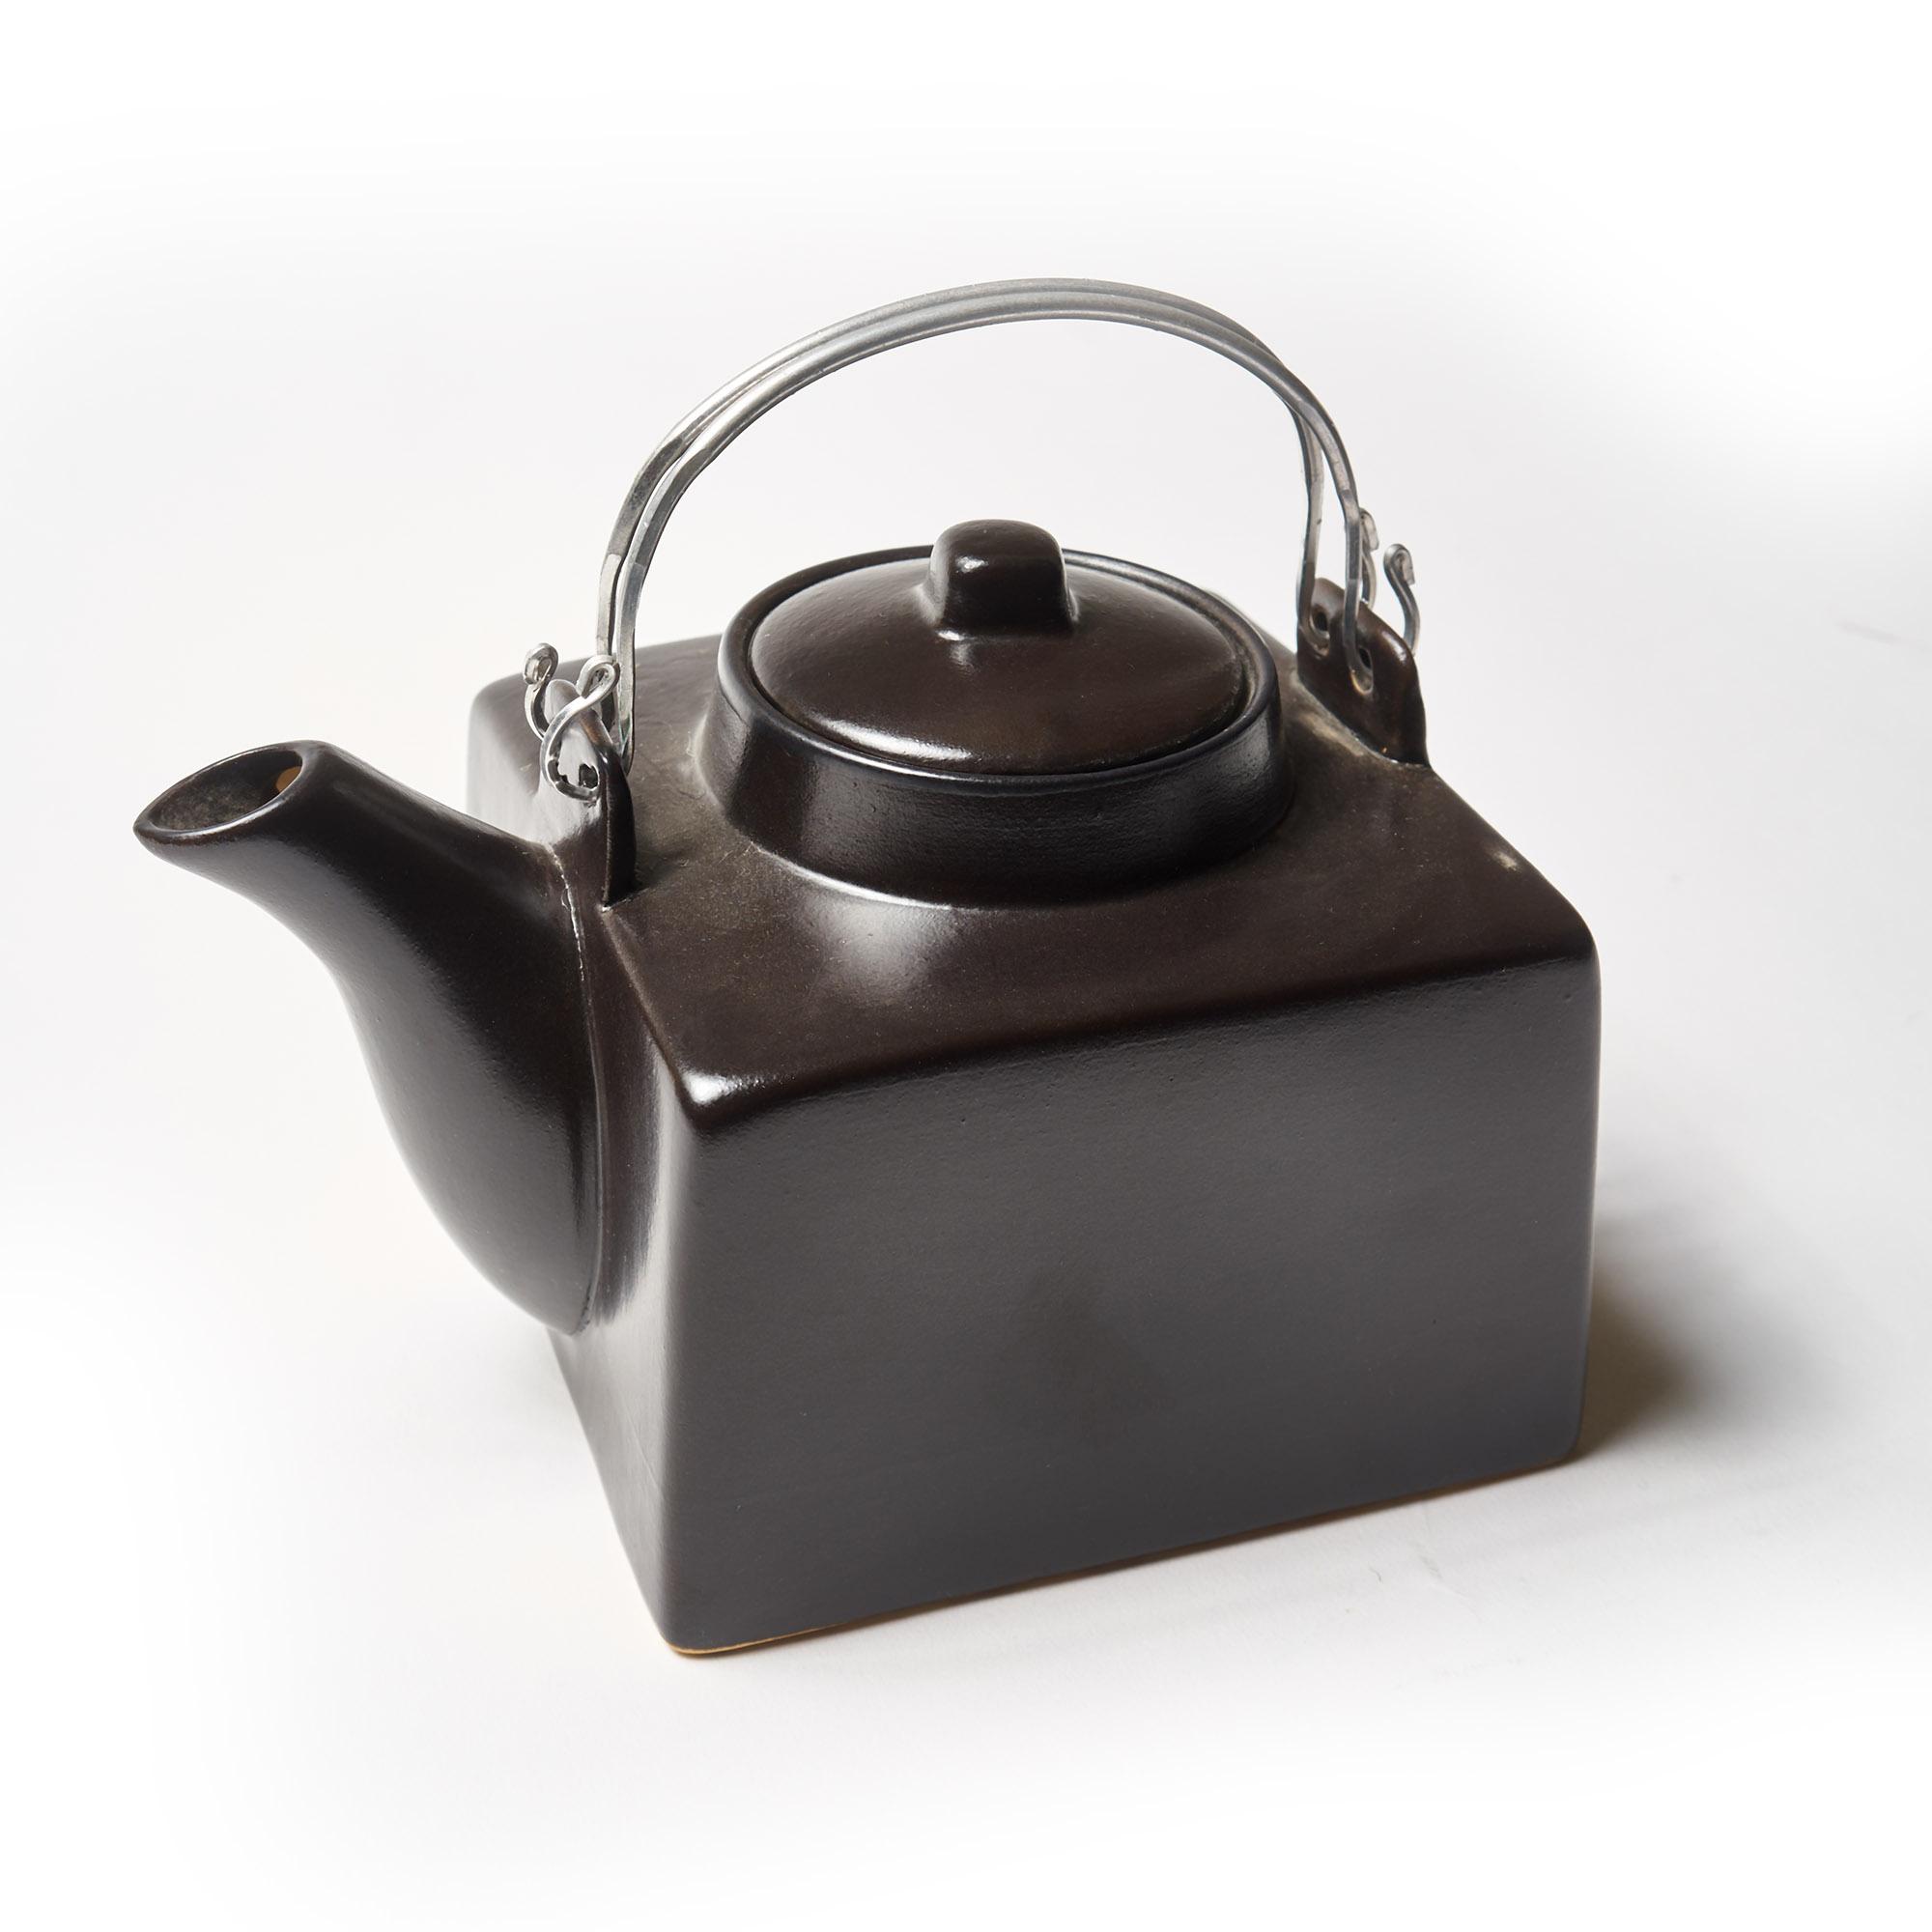 Tetera grande cerámica negra con asa de metal plateado